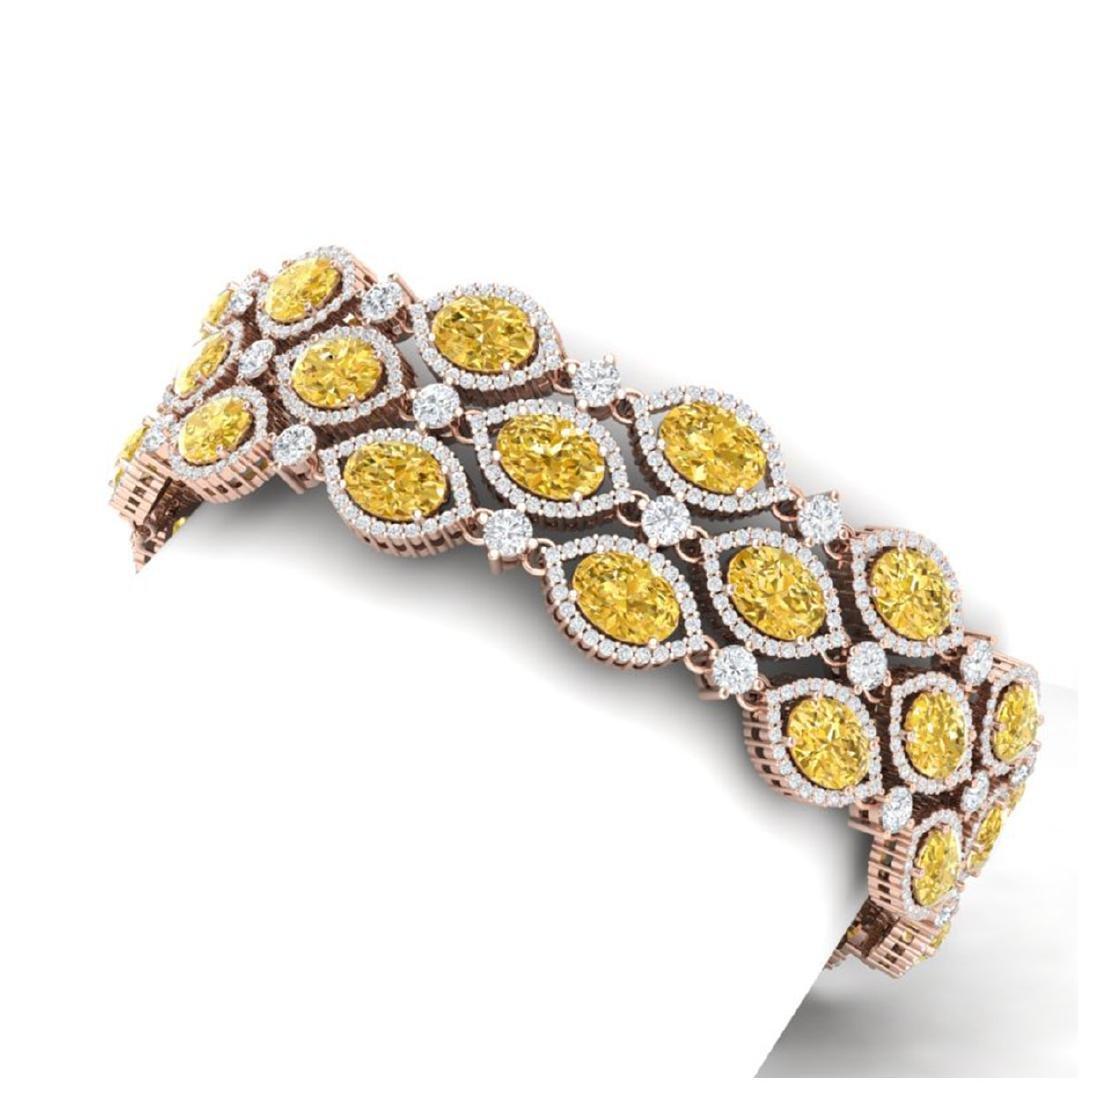 43.84 ctw Canary Citrine & VS Diamond Bracelet 18K Rose - 2